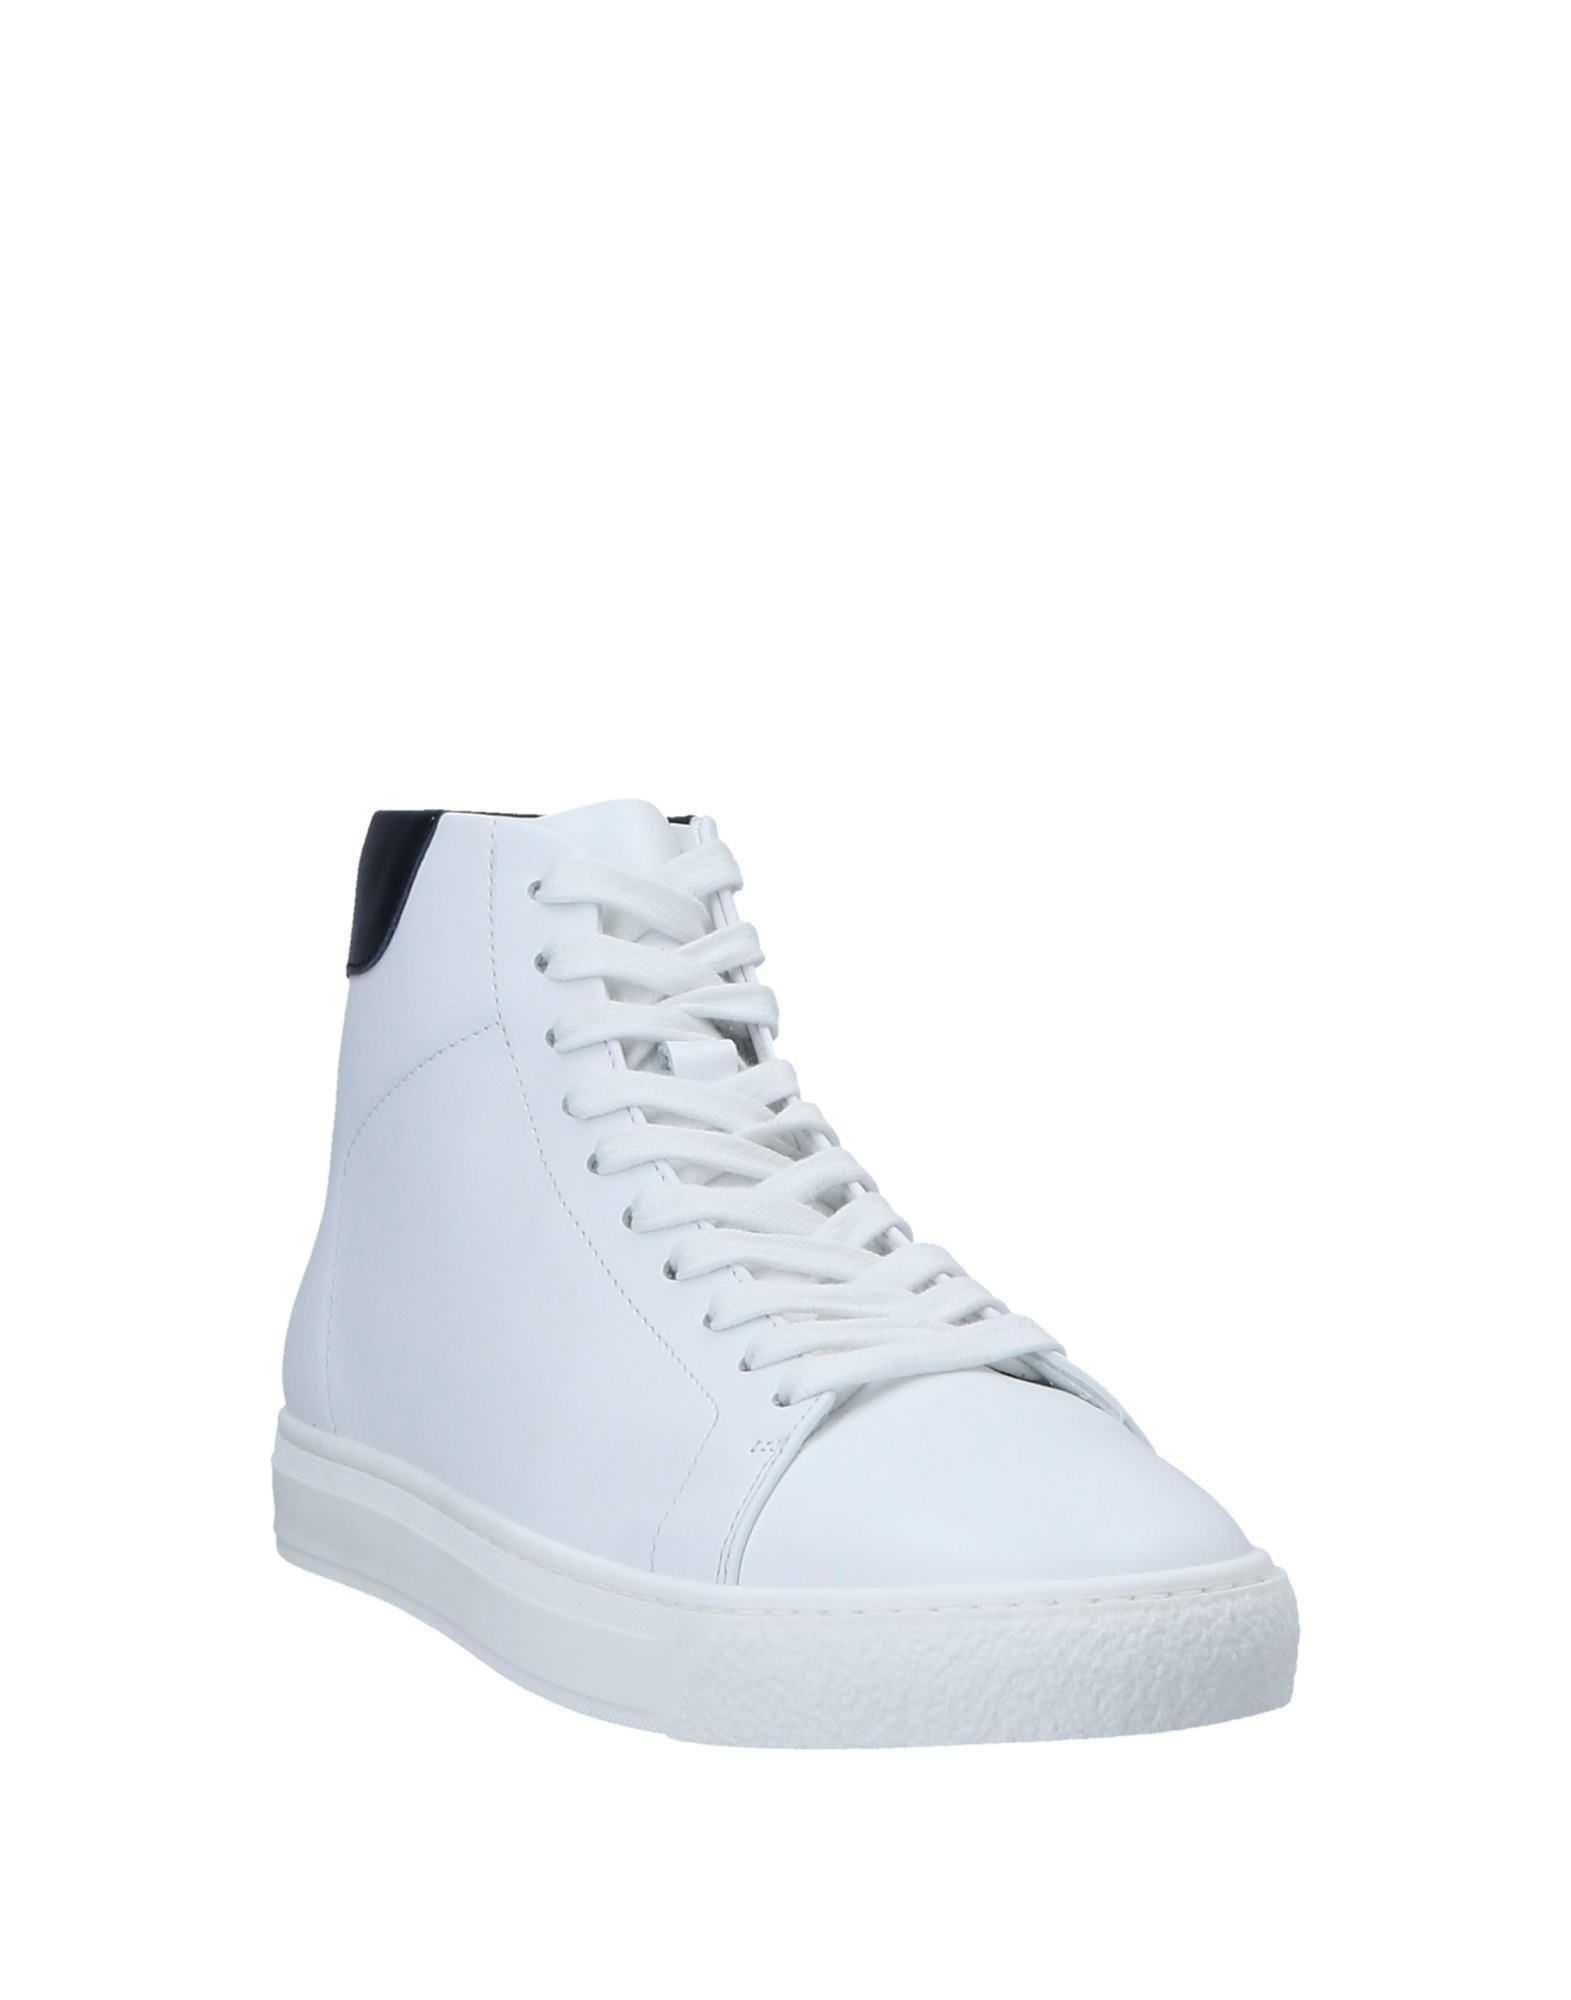 Rabatt Schuhe Sneakers Anya Hindmarch Sneakers Schuhe Damen  11552513FX 0370d0